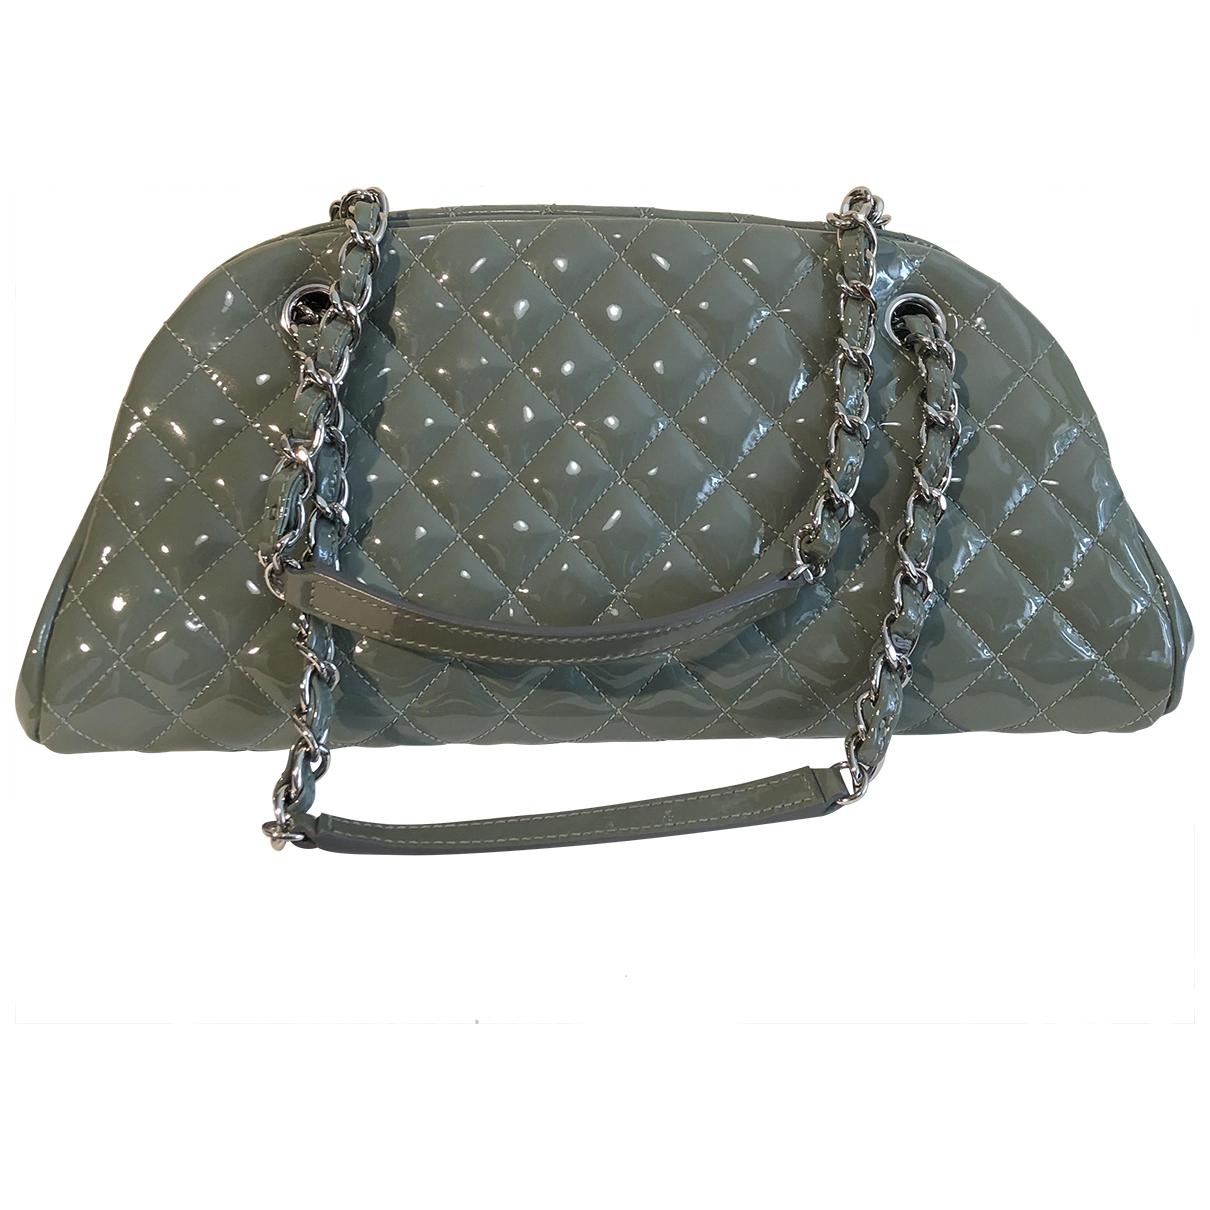 Chanel Mademoiselle Green Patent leather handbag for Women \N